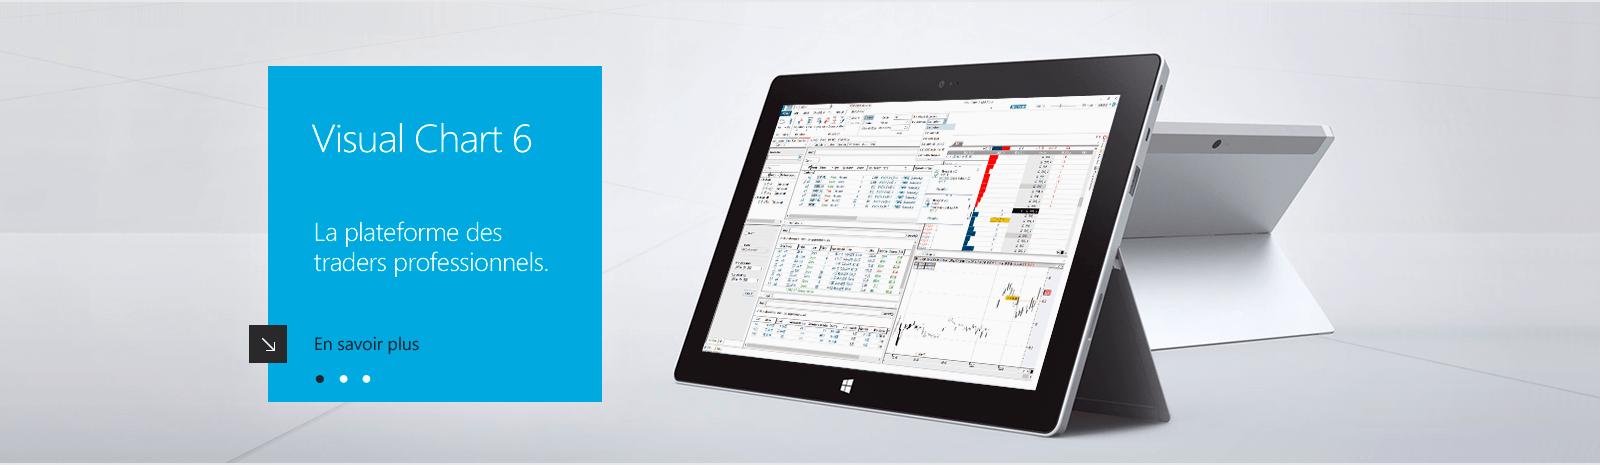 Visual Chart Software de trading et analyse technique